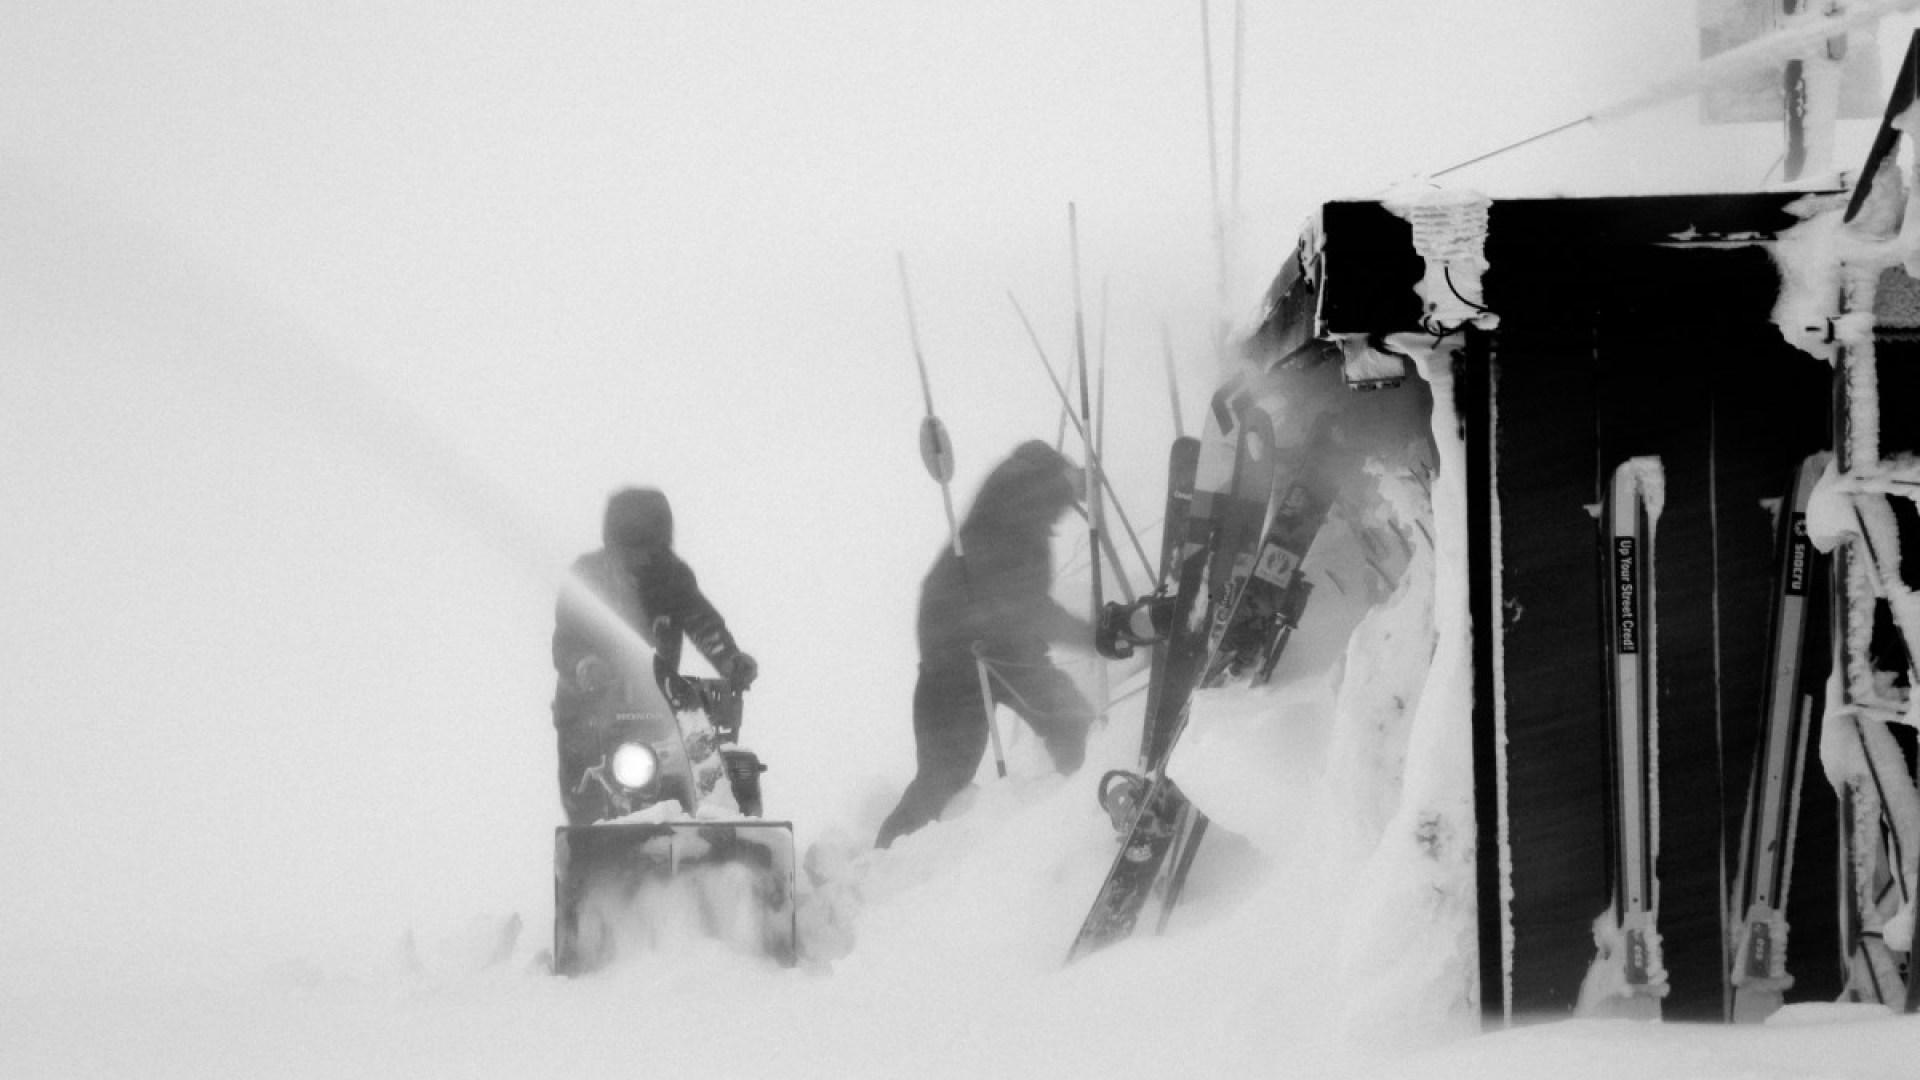 c59c449006da7 JHMR Skiing Winter Tetons Wyoming